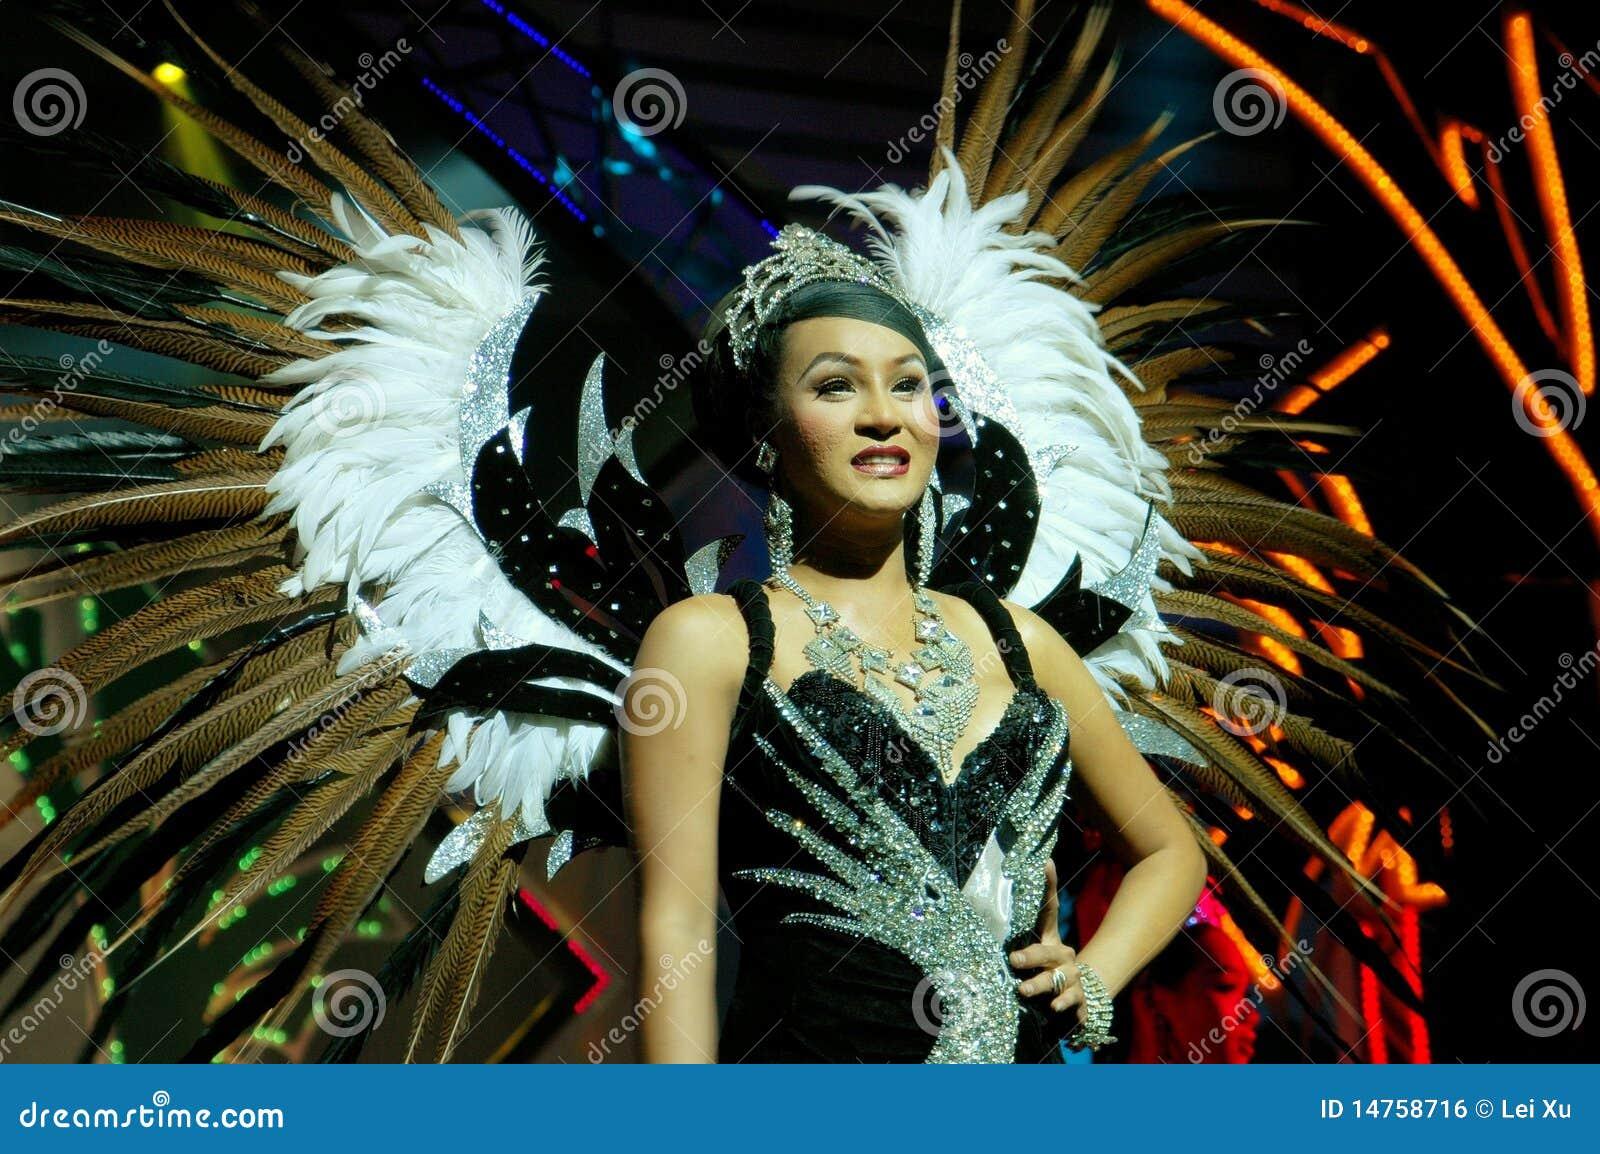 Ladyboy show pattaya thailand-8340